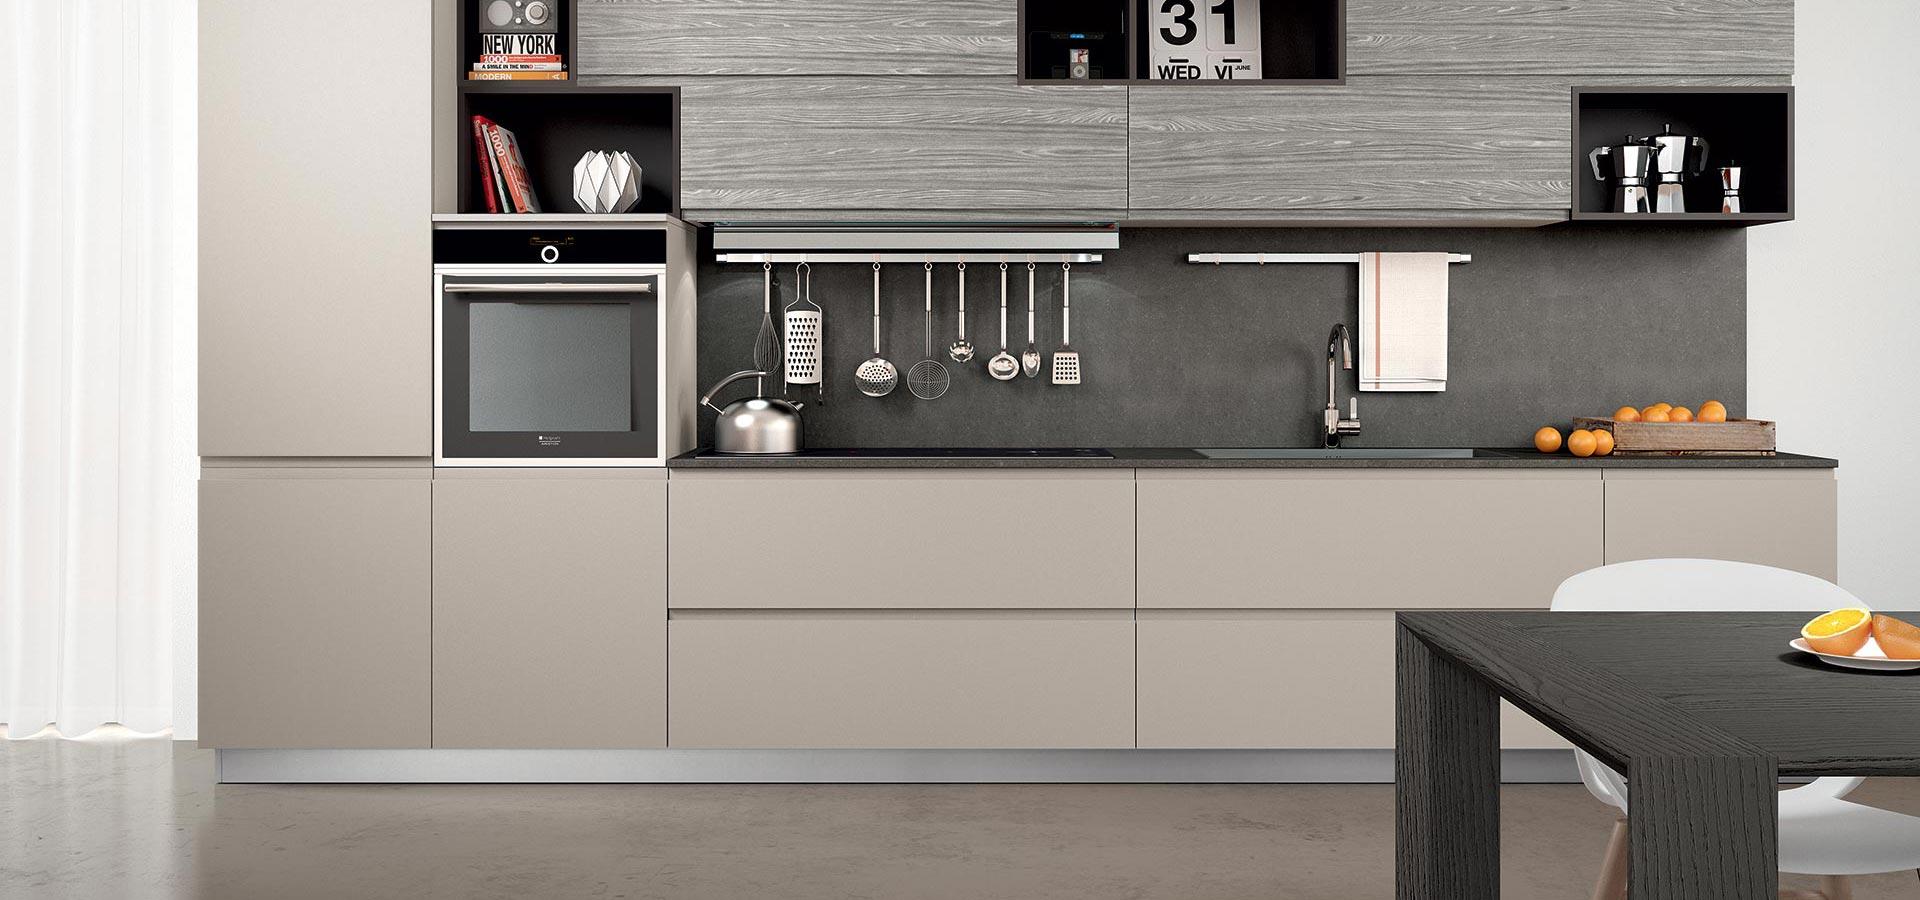 Wega modern kitchen arredo3 for Cucine classiche arredo 3